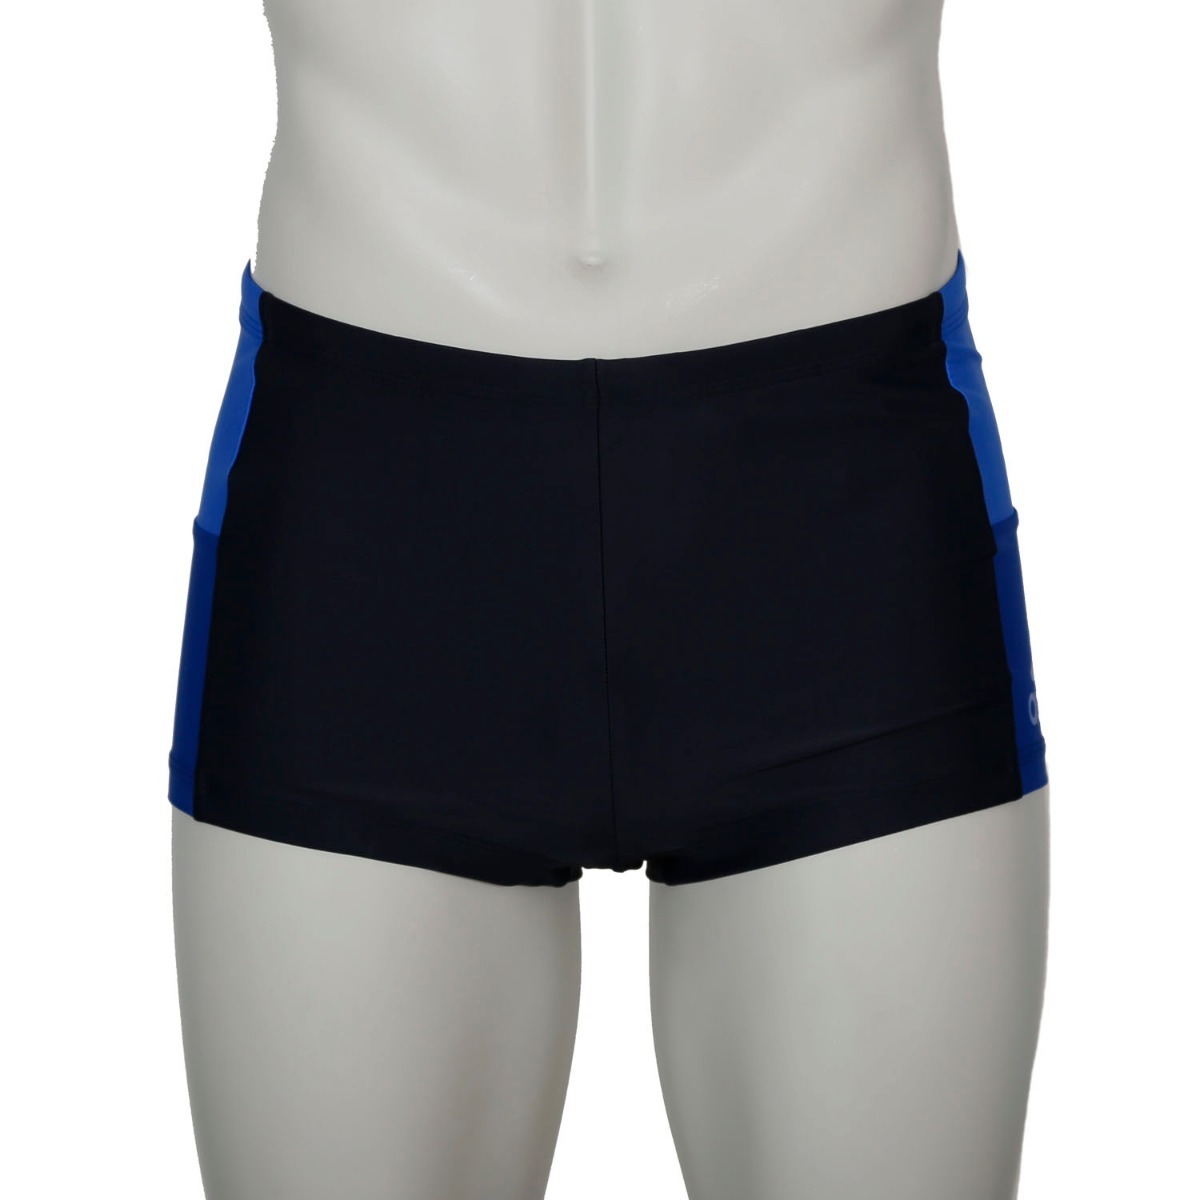 594a78487bf4 Shorts De Natación adidas Infinitex Bs0464 100% Original